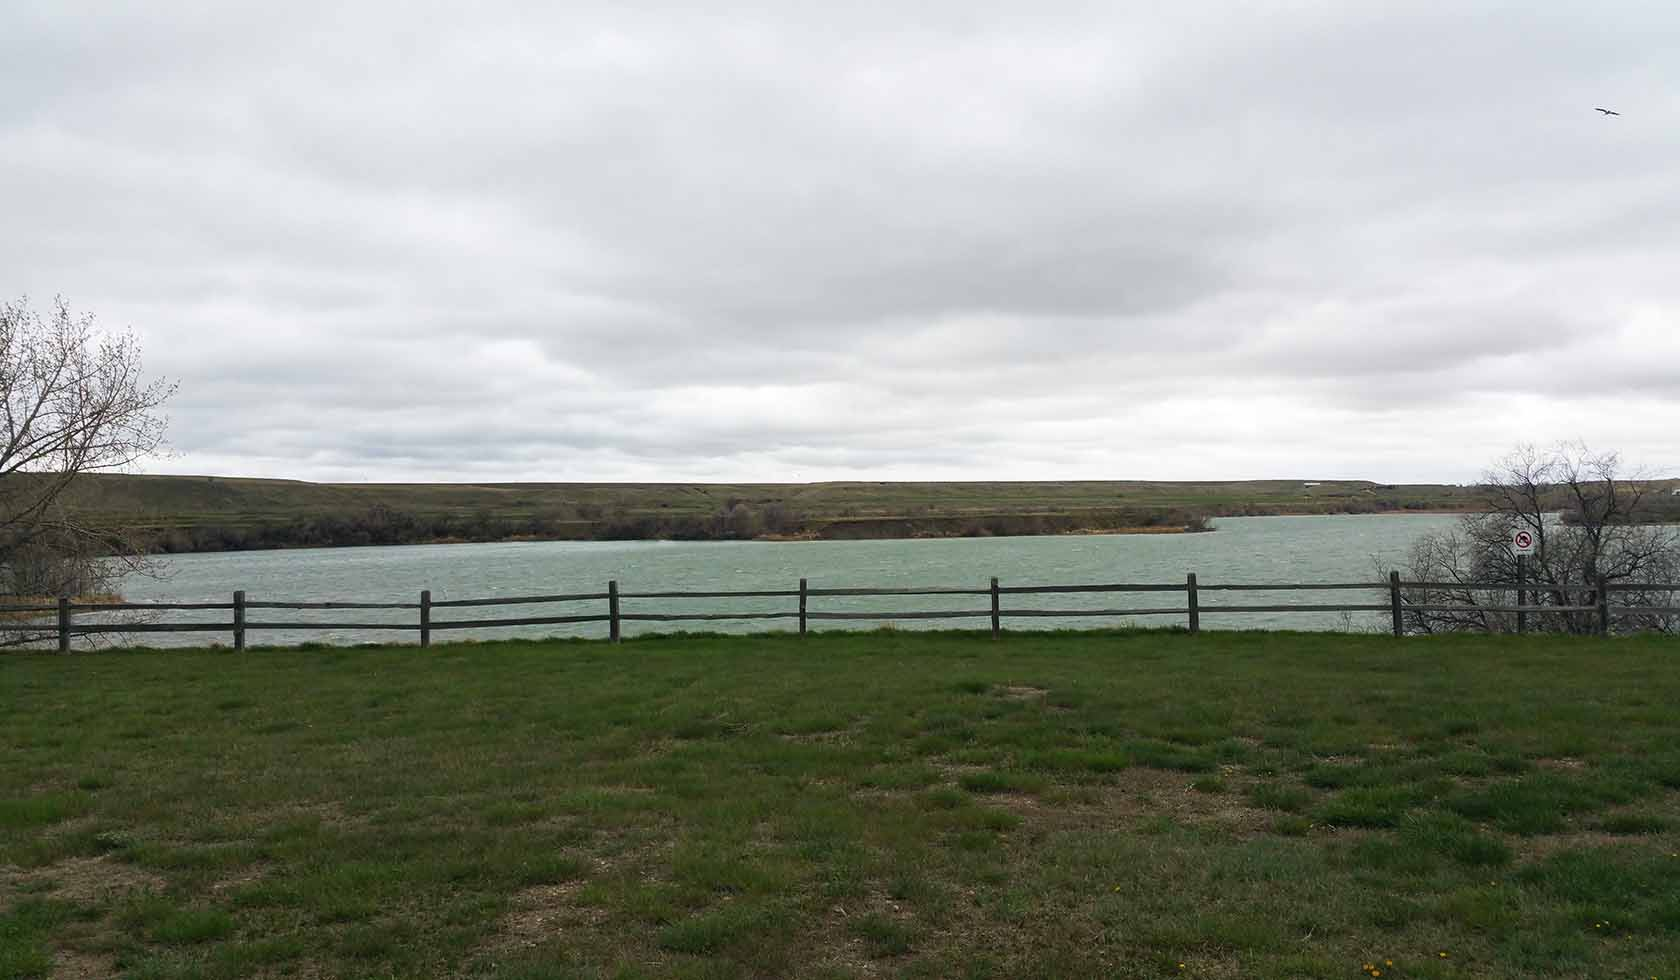 Dredge Cut | Missouri River Country